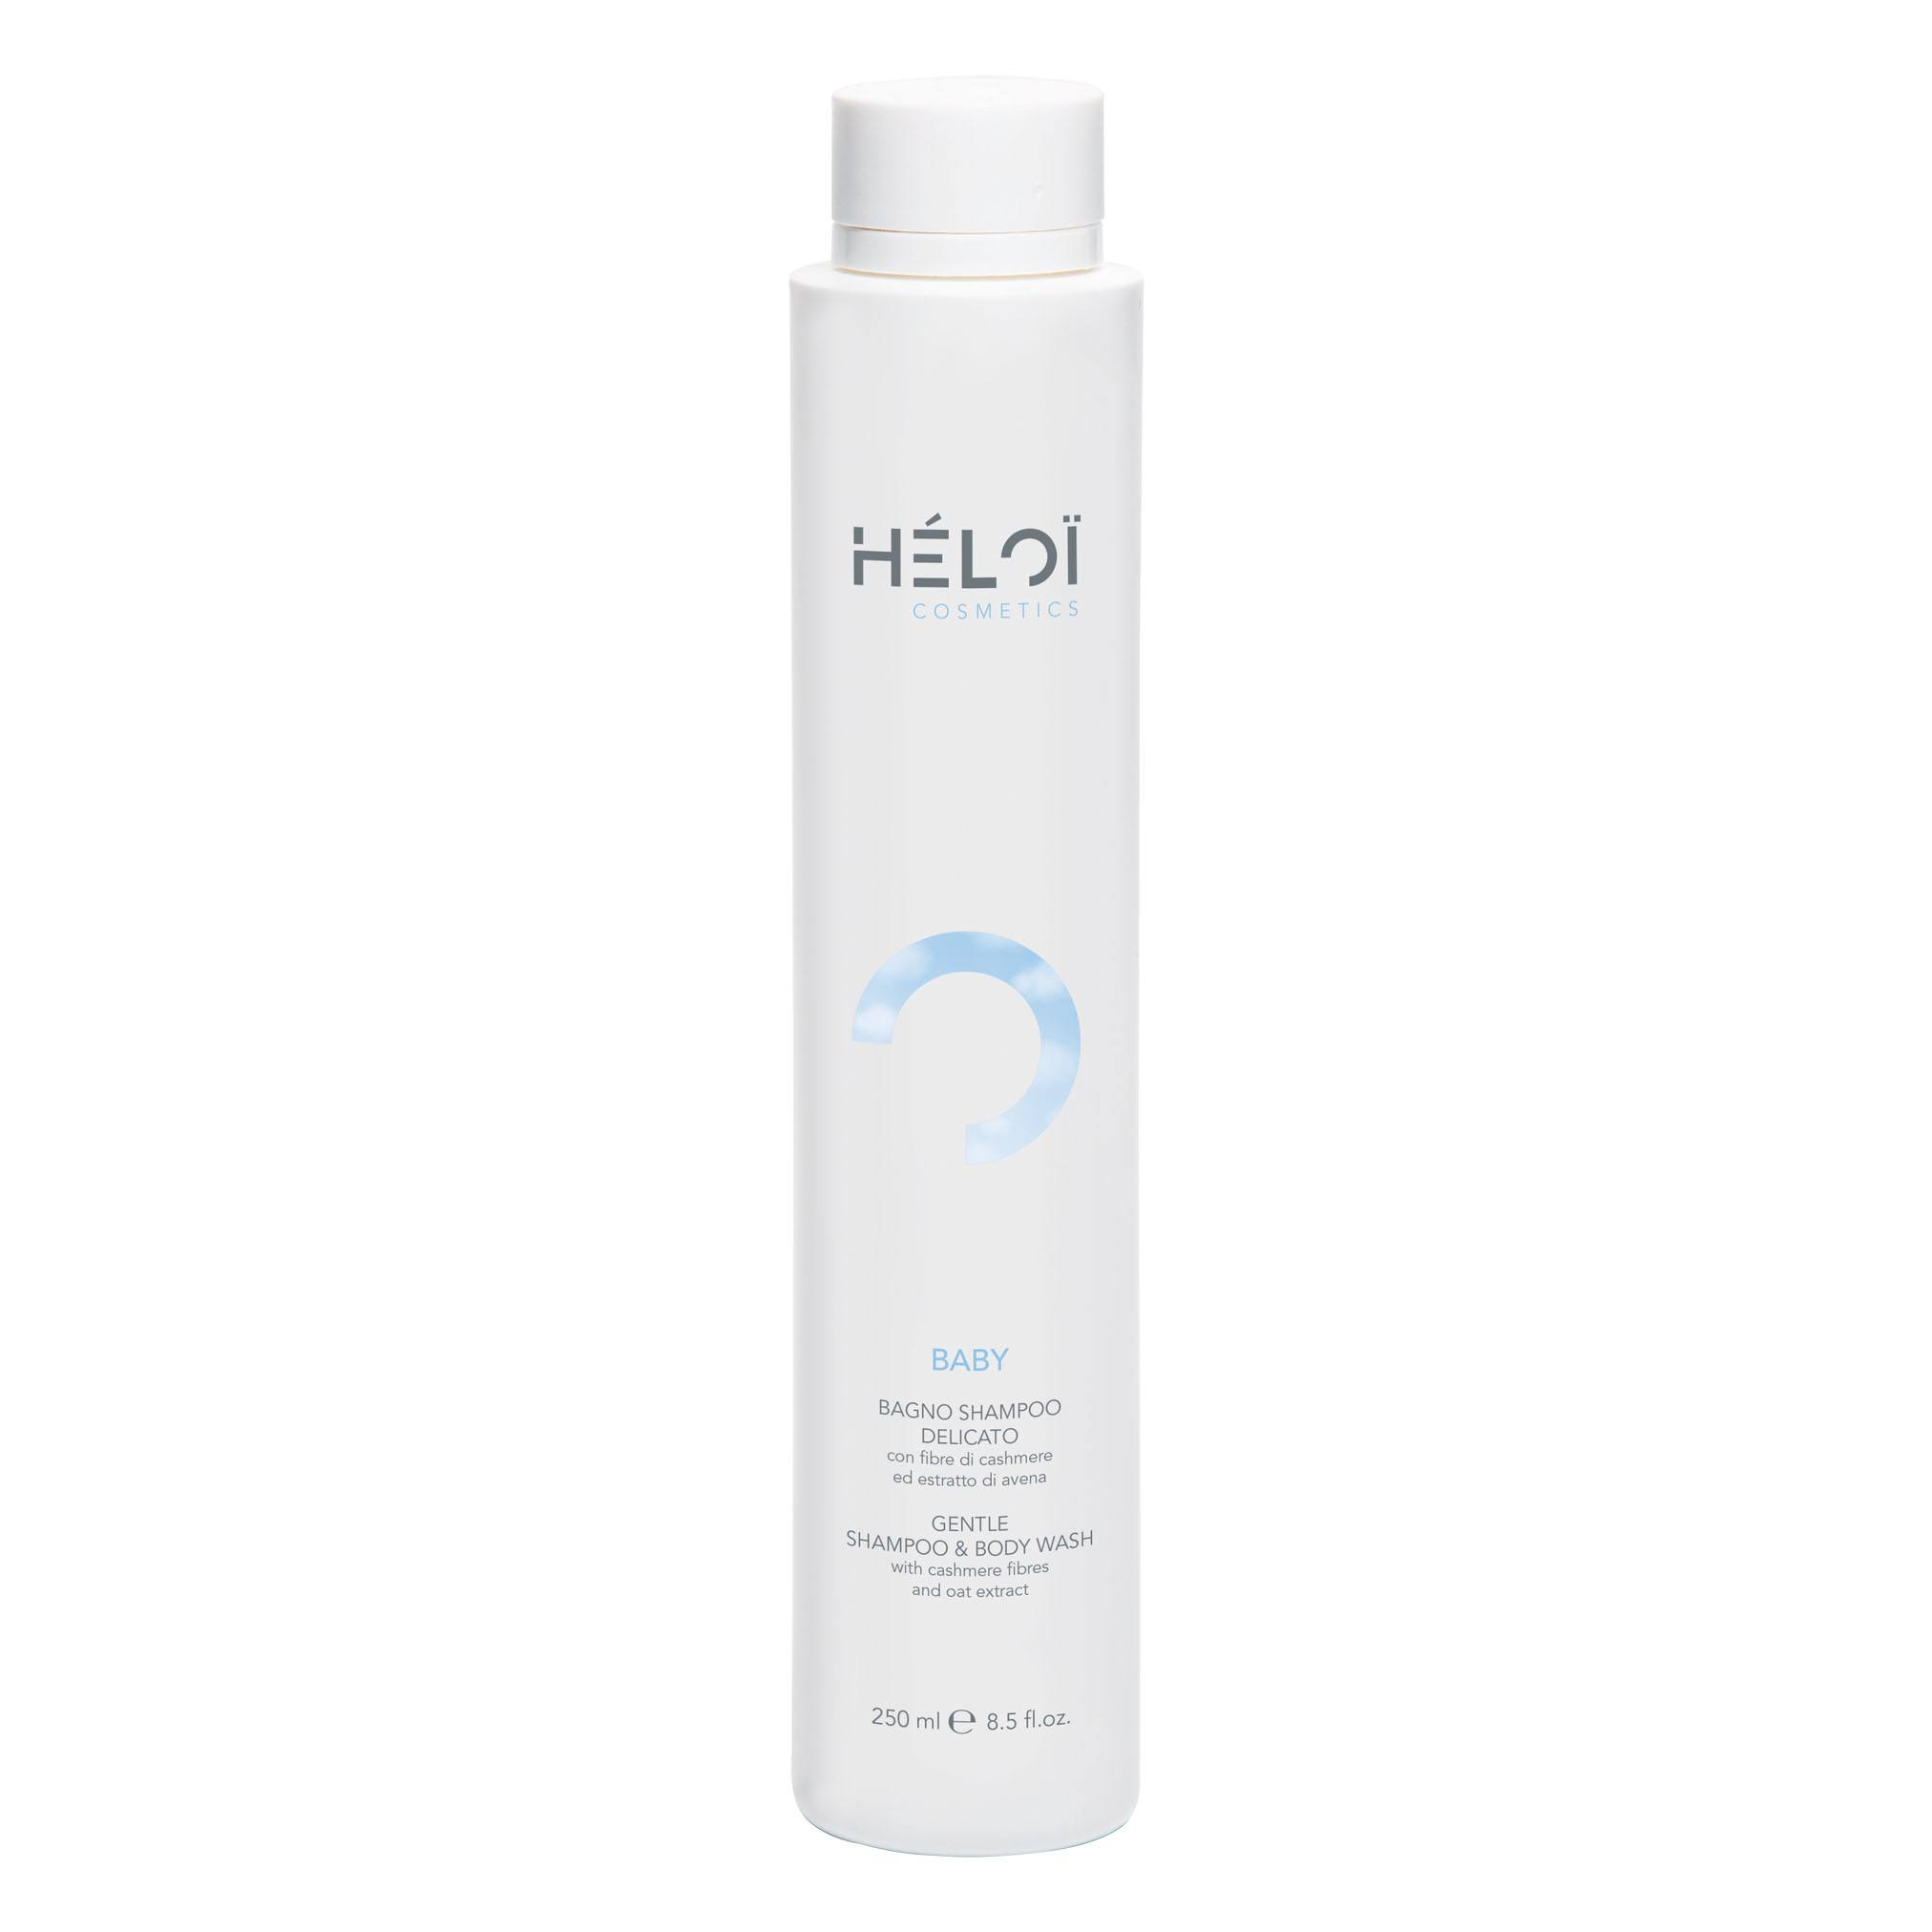 Bagno shampoo